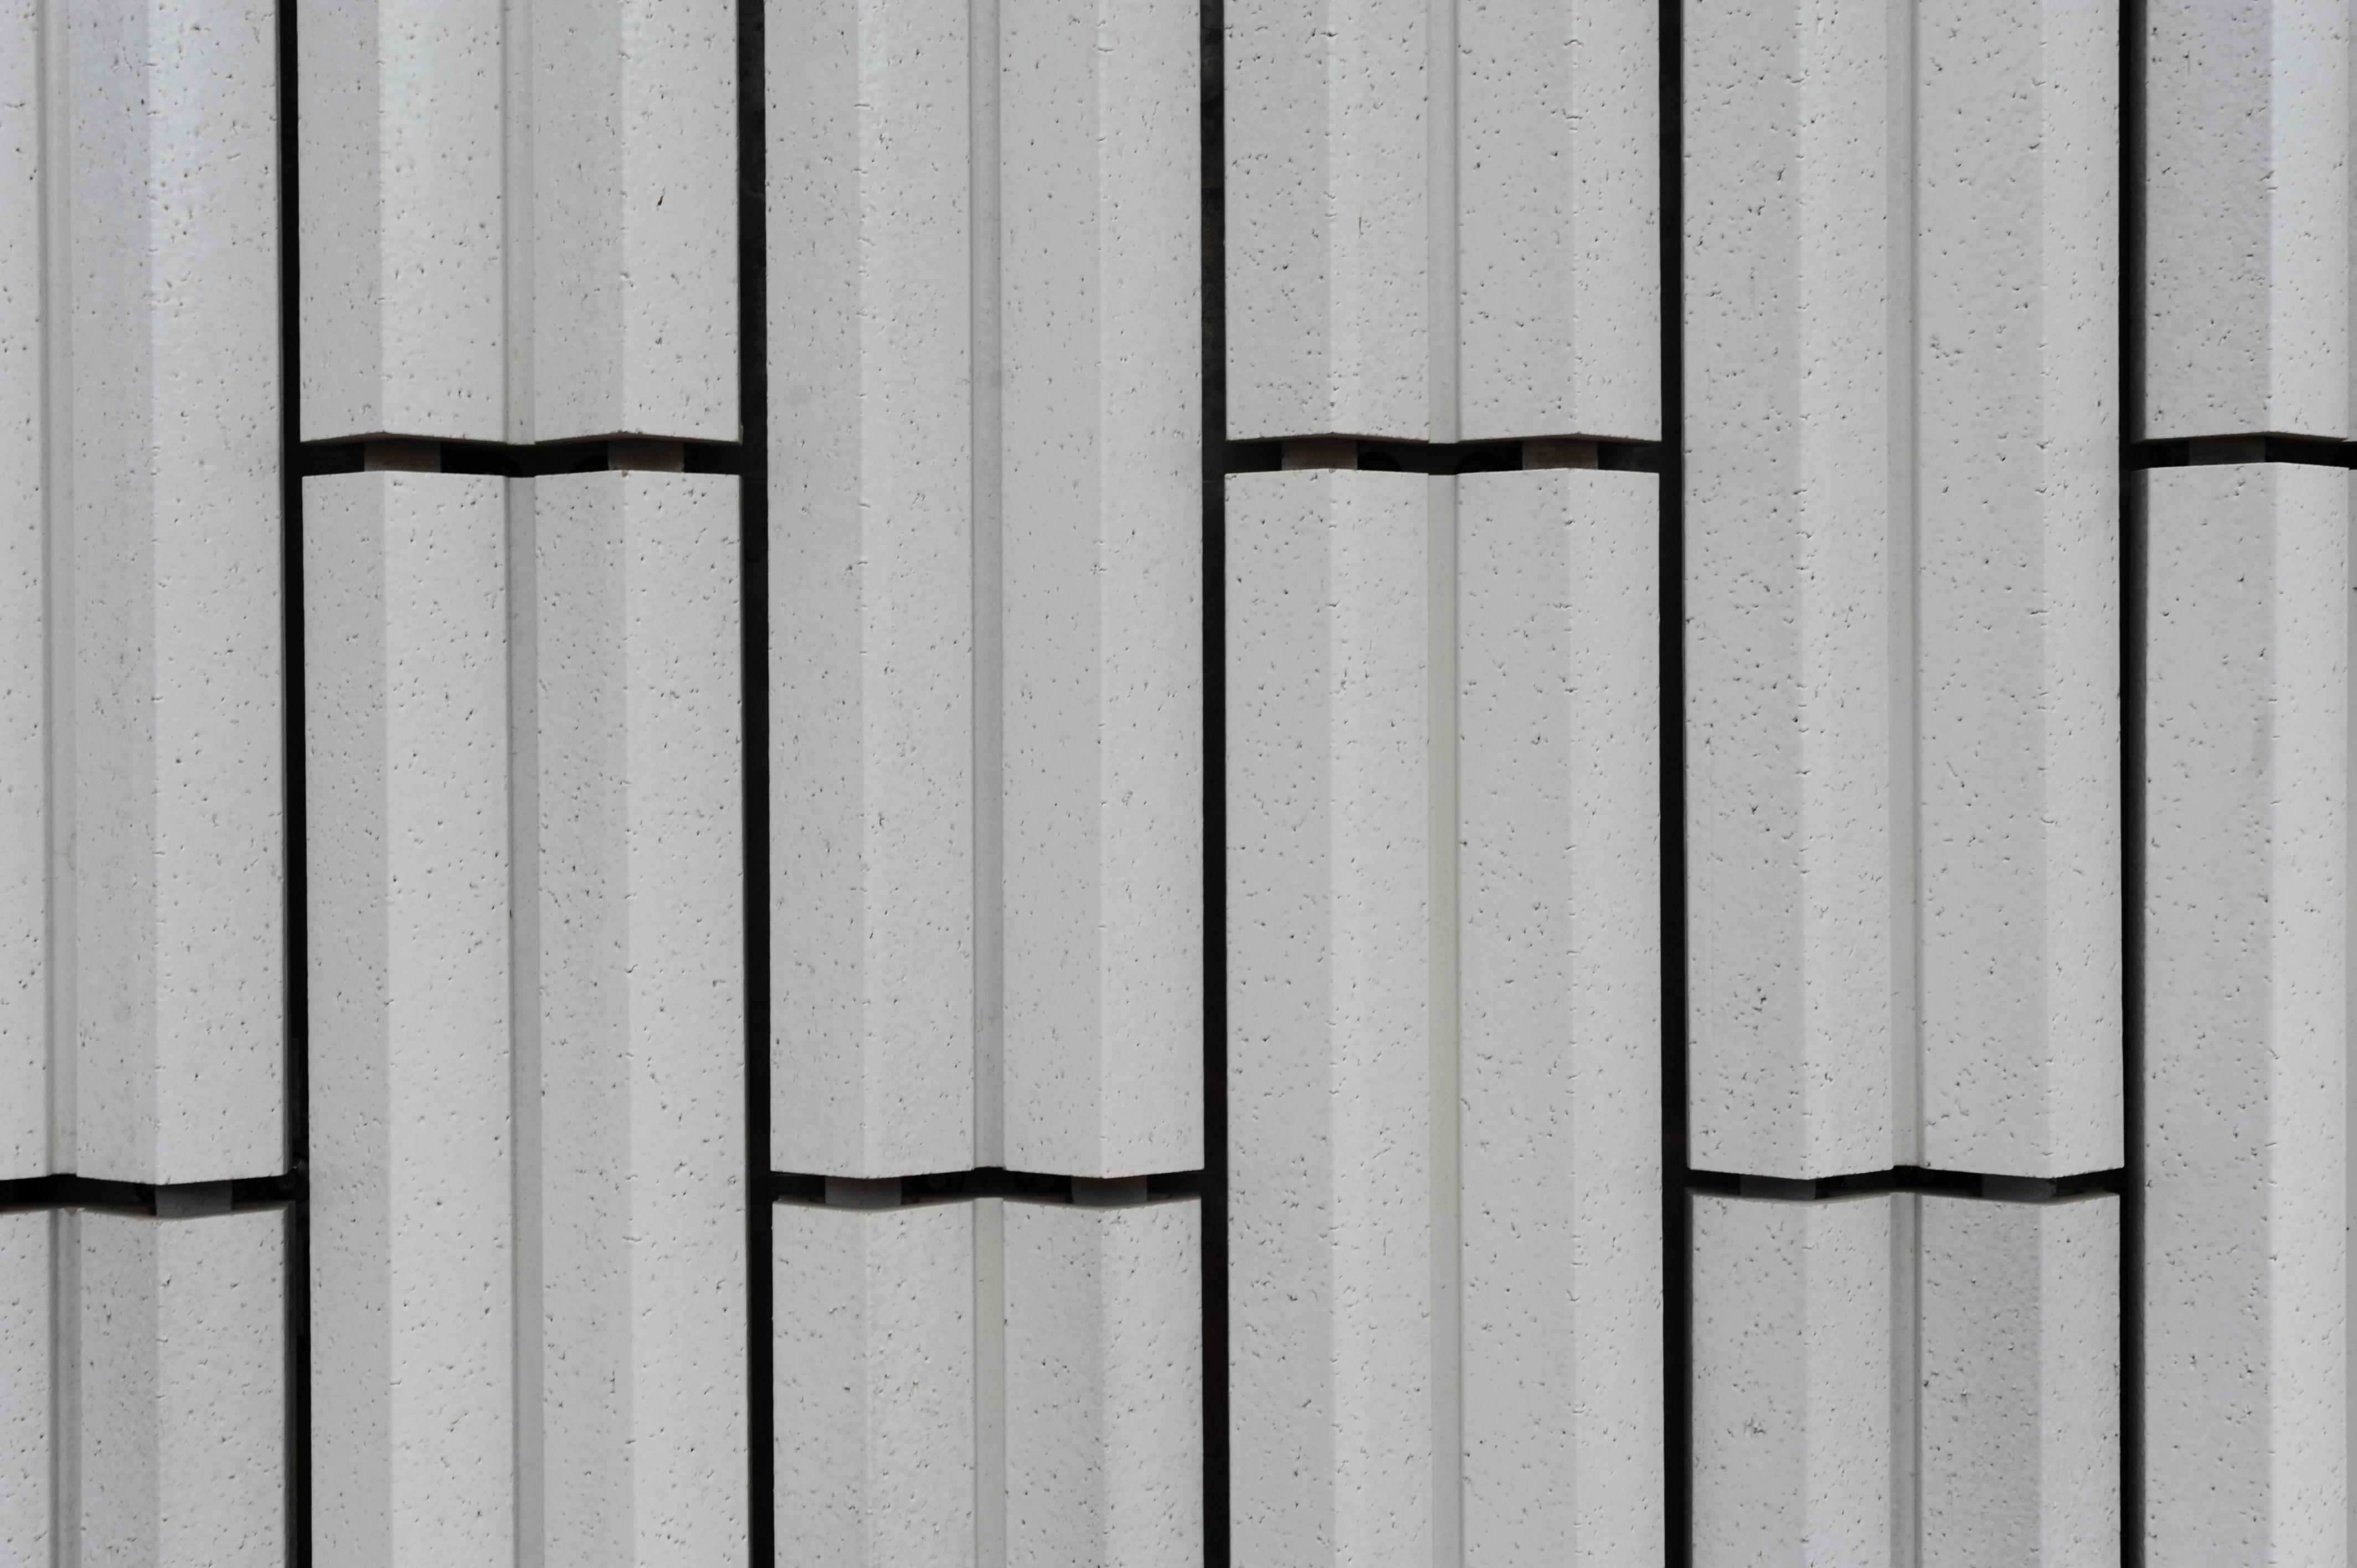 Expressive and dynamic Malmö Live facade. #architecture #facade #malmolive #shlarchitects